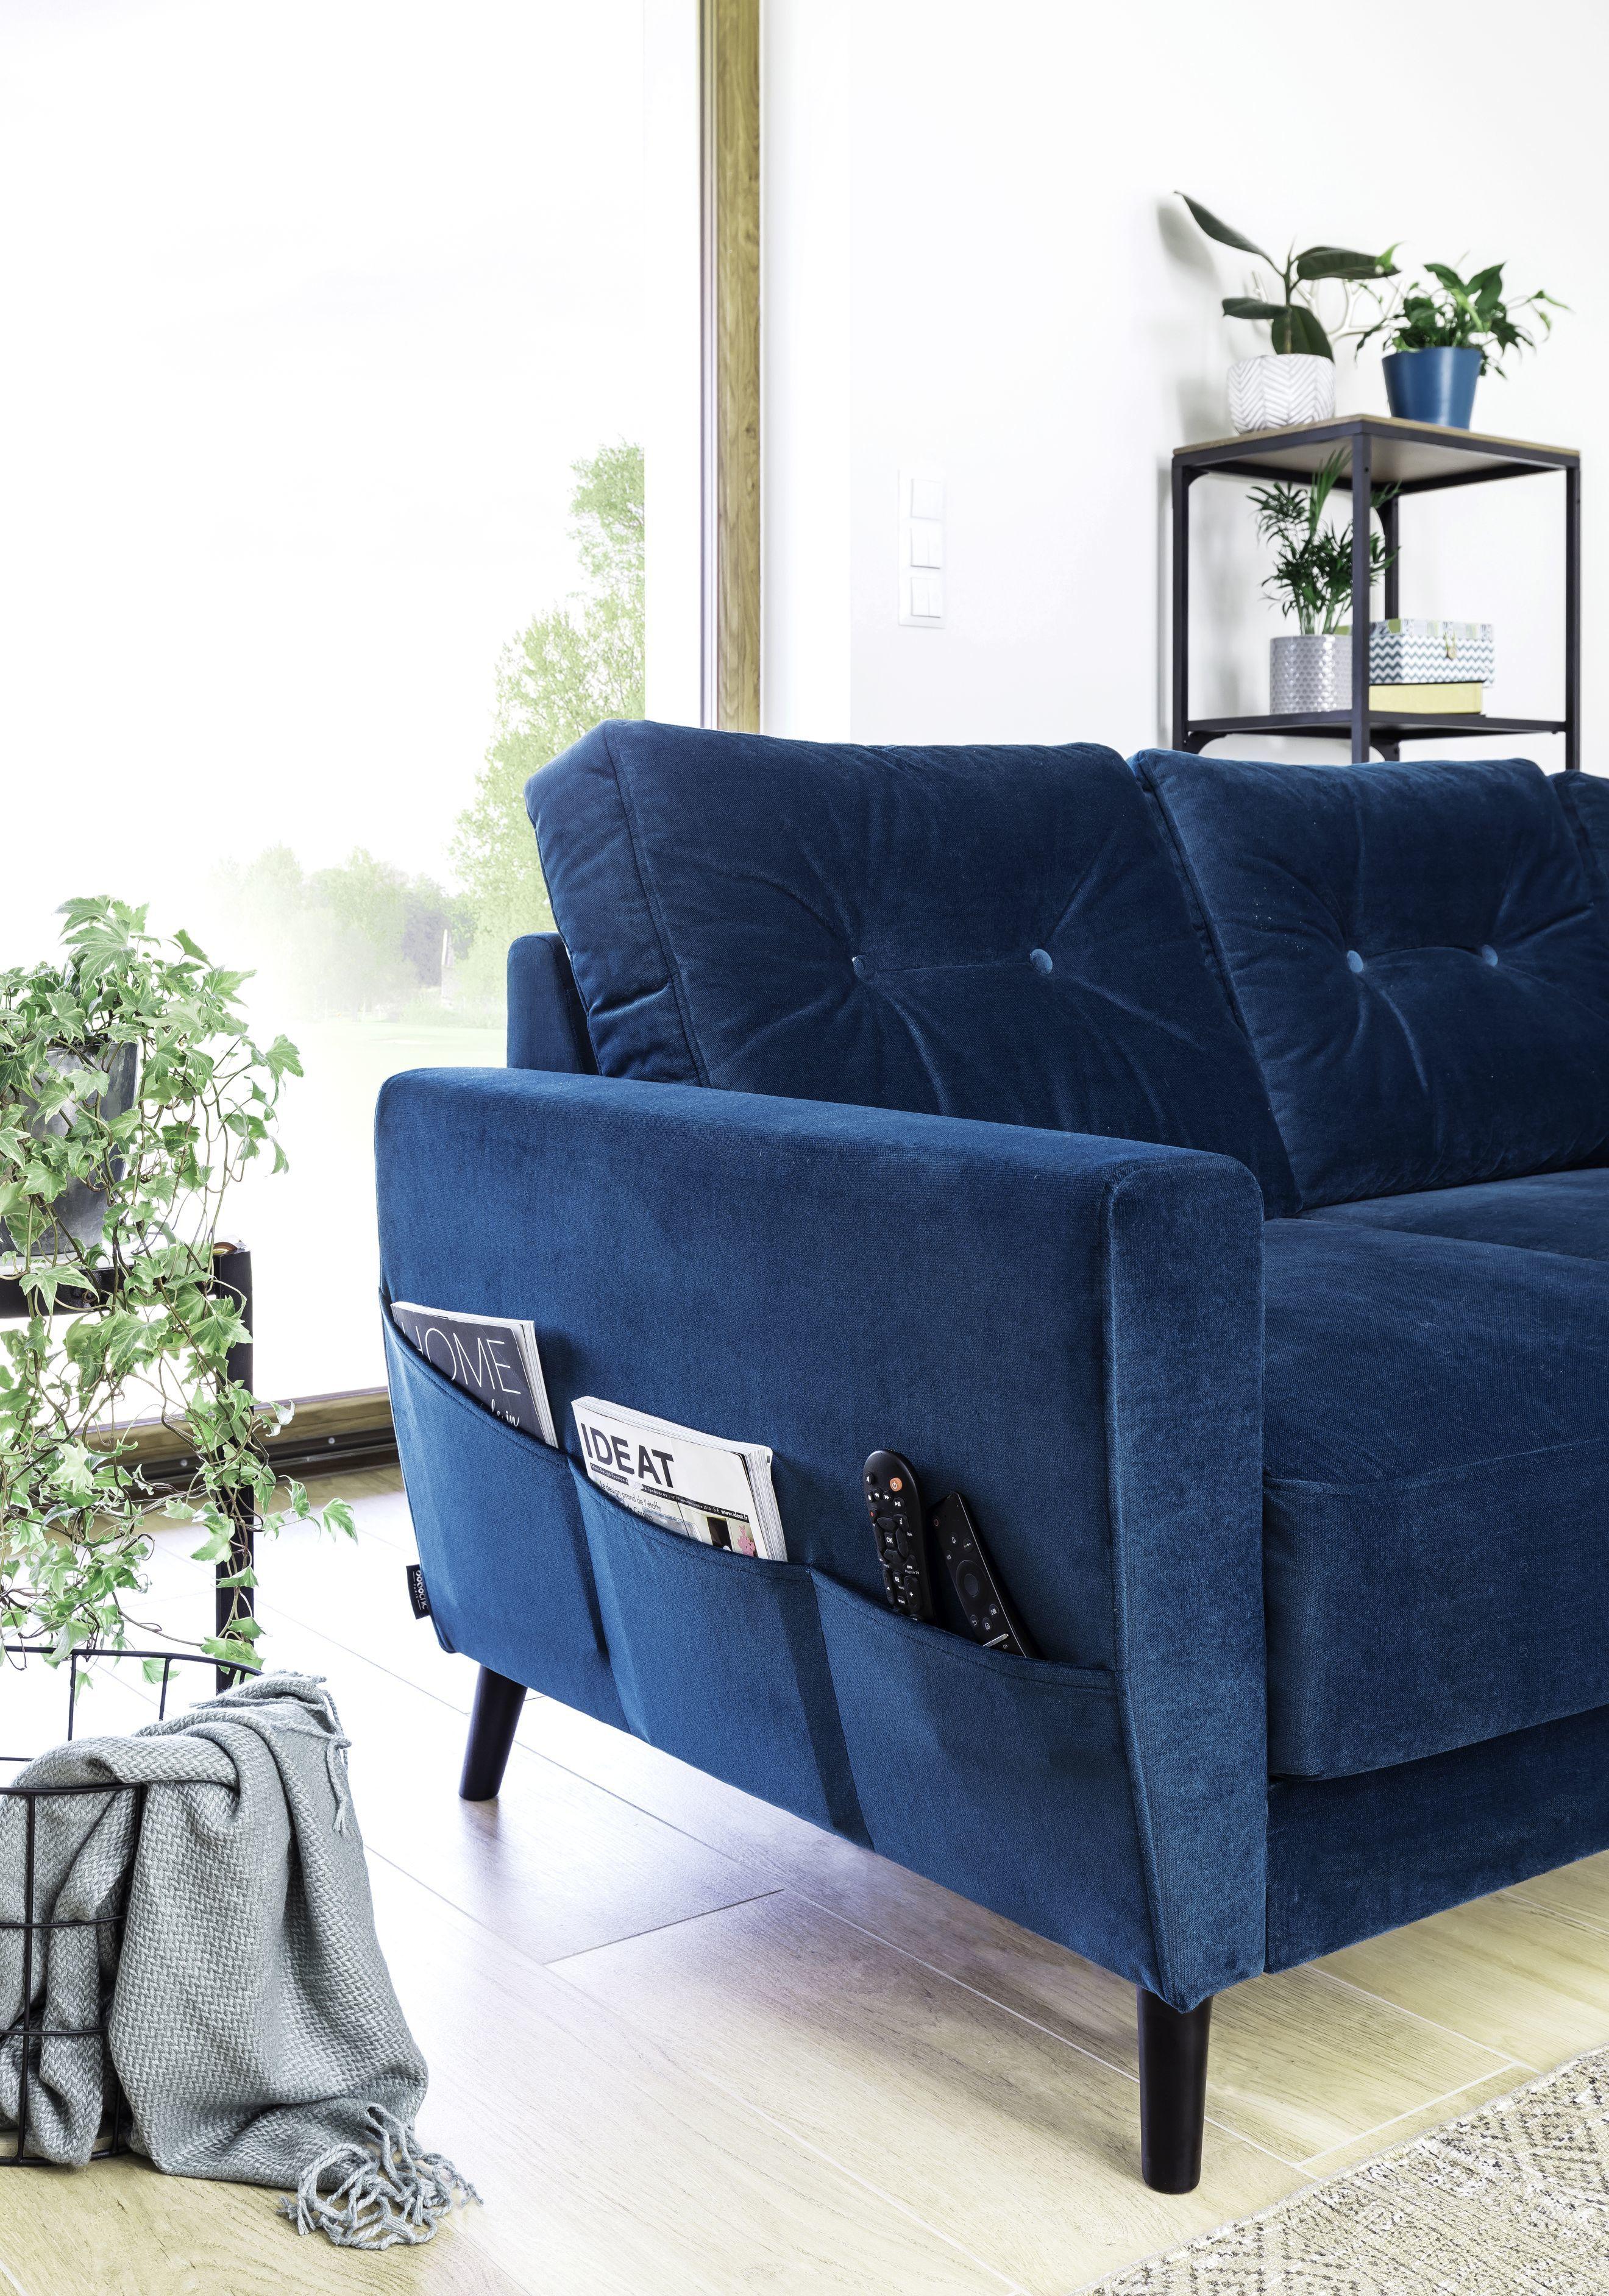 bobochic - canapé scandi l fixe angle droit bleu marine velours